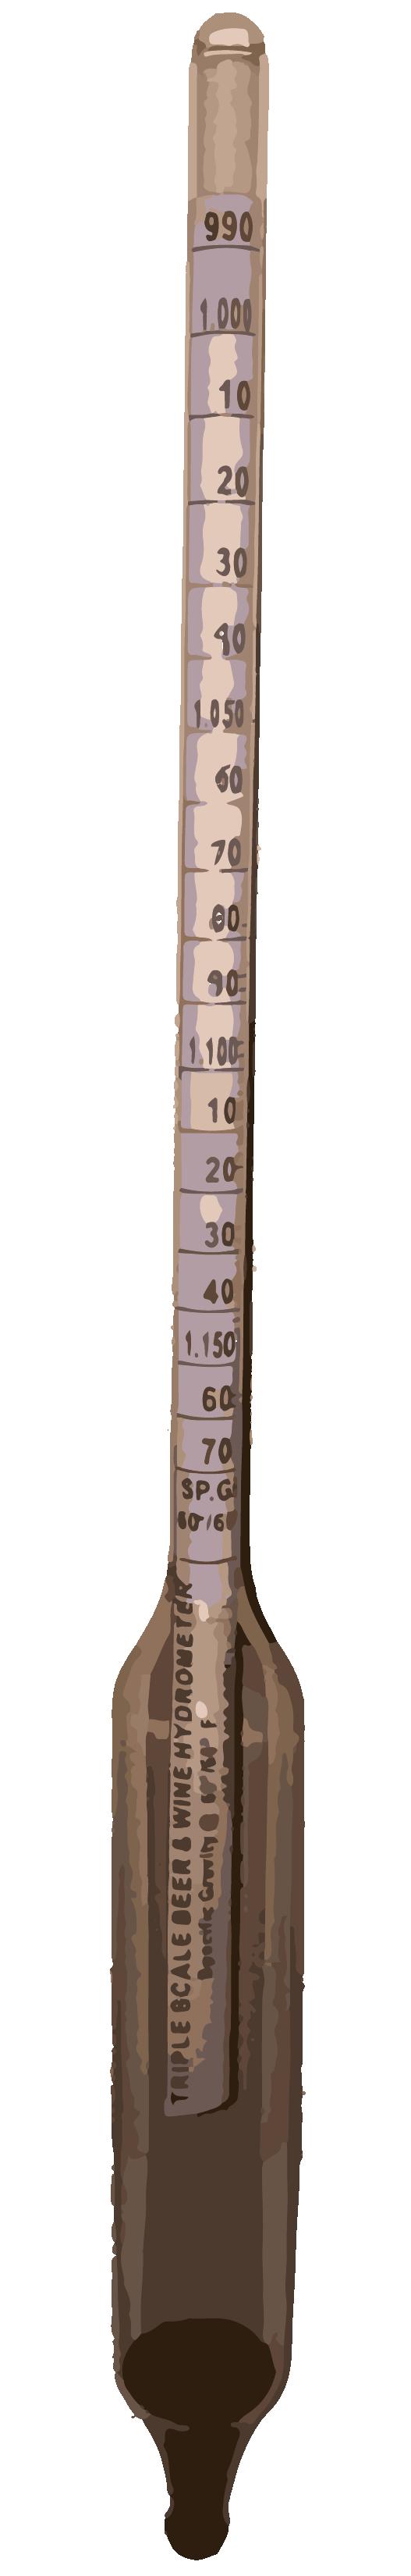 hydrometer2-02.png